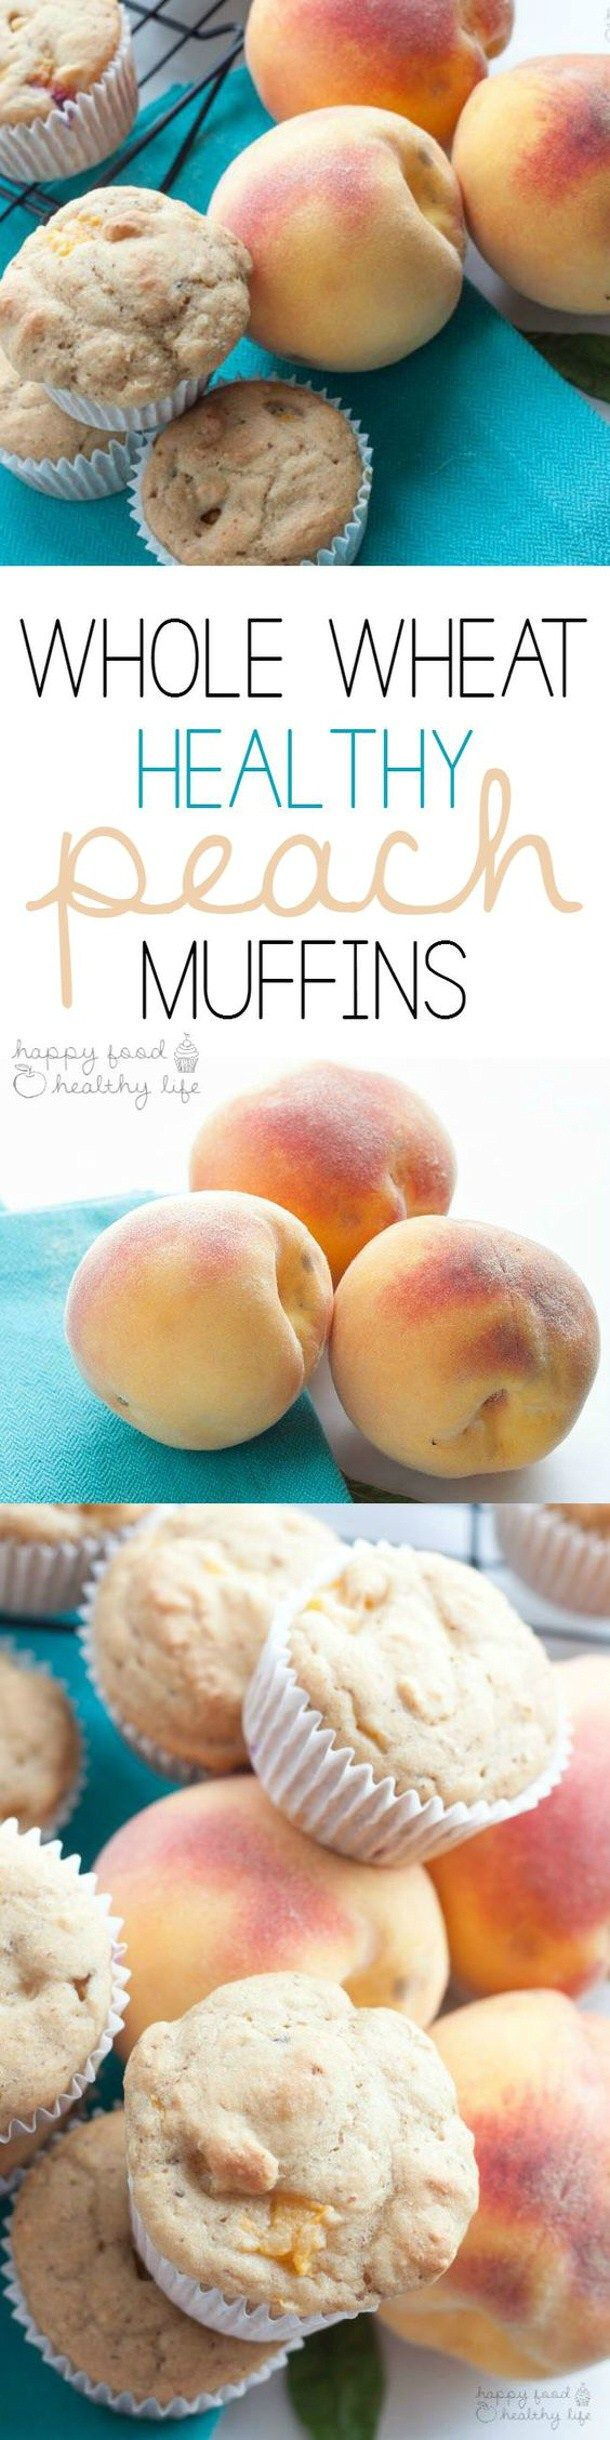 Healthy Snacks - Whole Wheat Healthy Peach Muffins Recipe via Happy Food Healthy Life